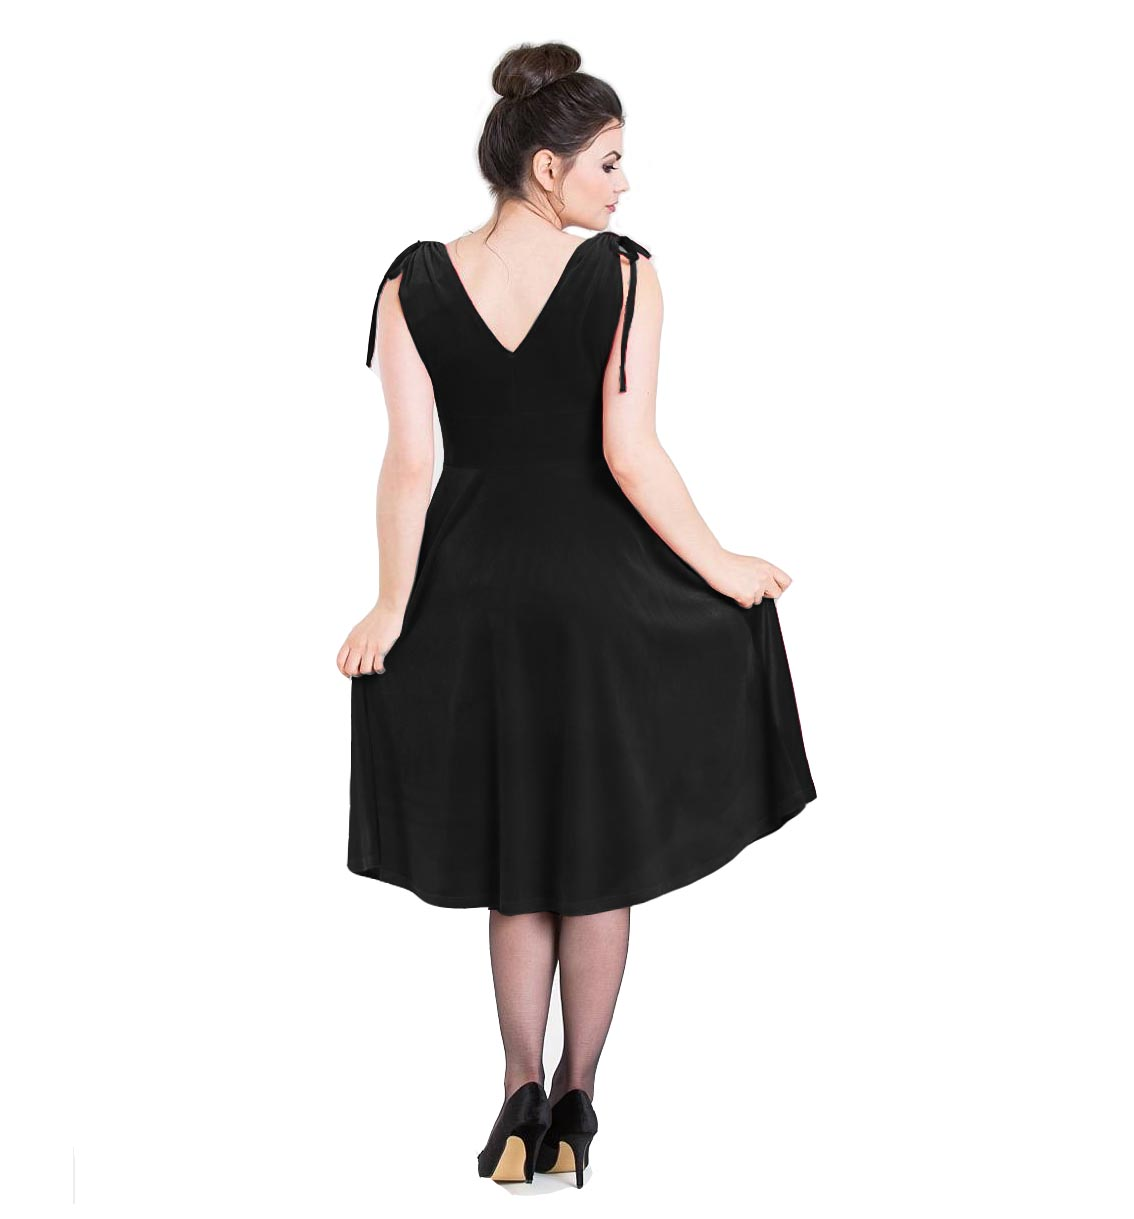 Hell-Bunny-40s-50s-Elegant-Pin-Up-Dress-MELINA-Crushed-Velvet-Black-All-Sizes thumbnail 25